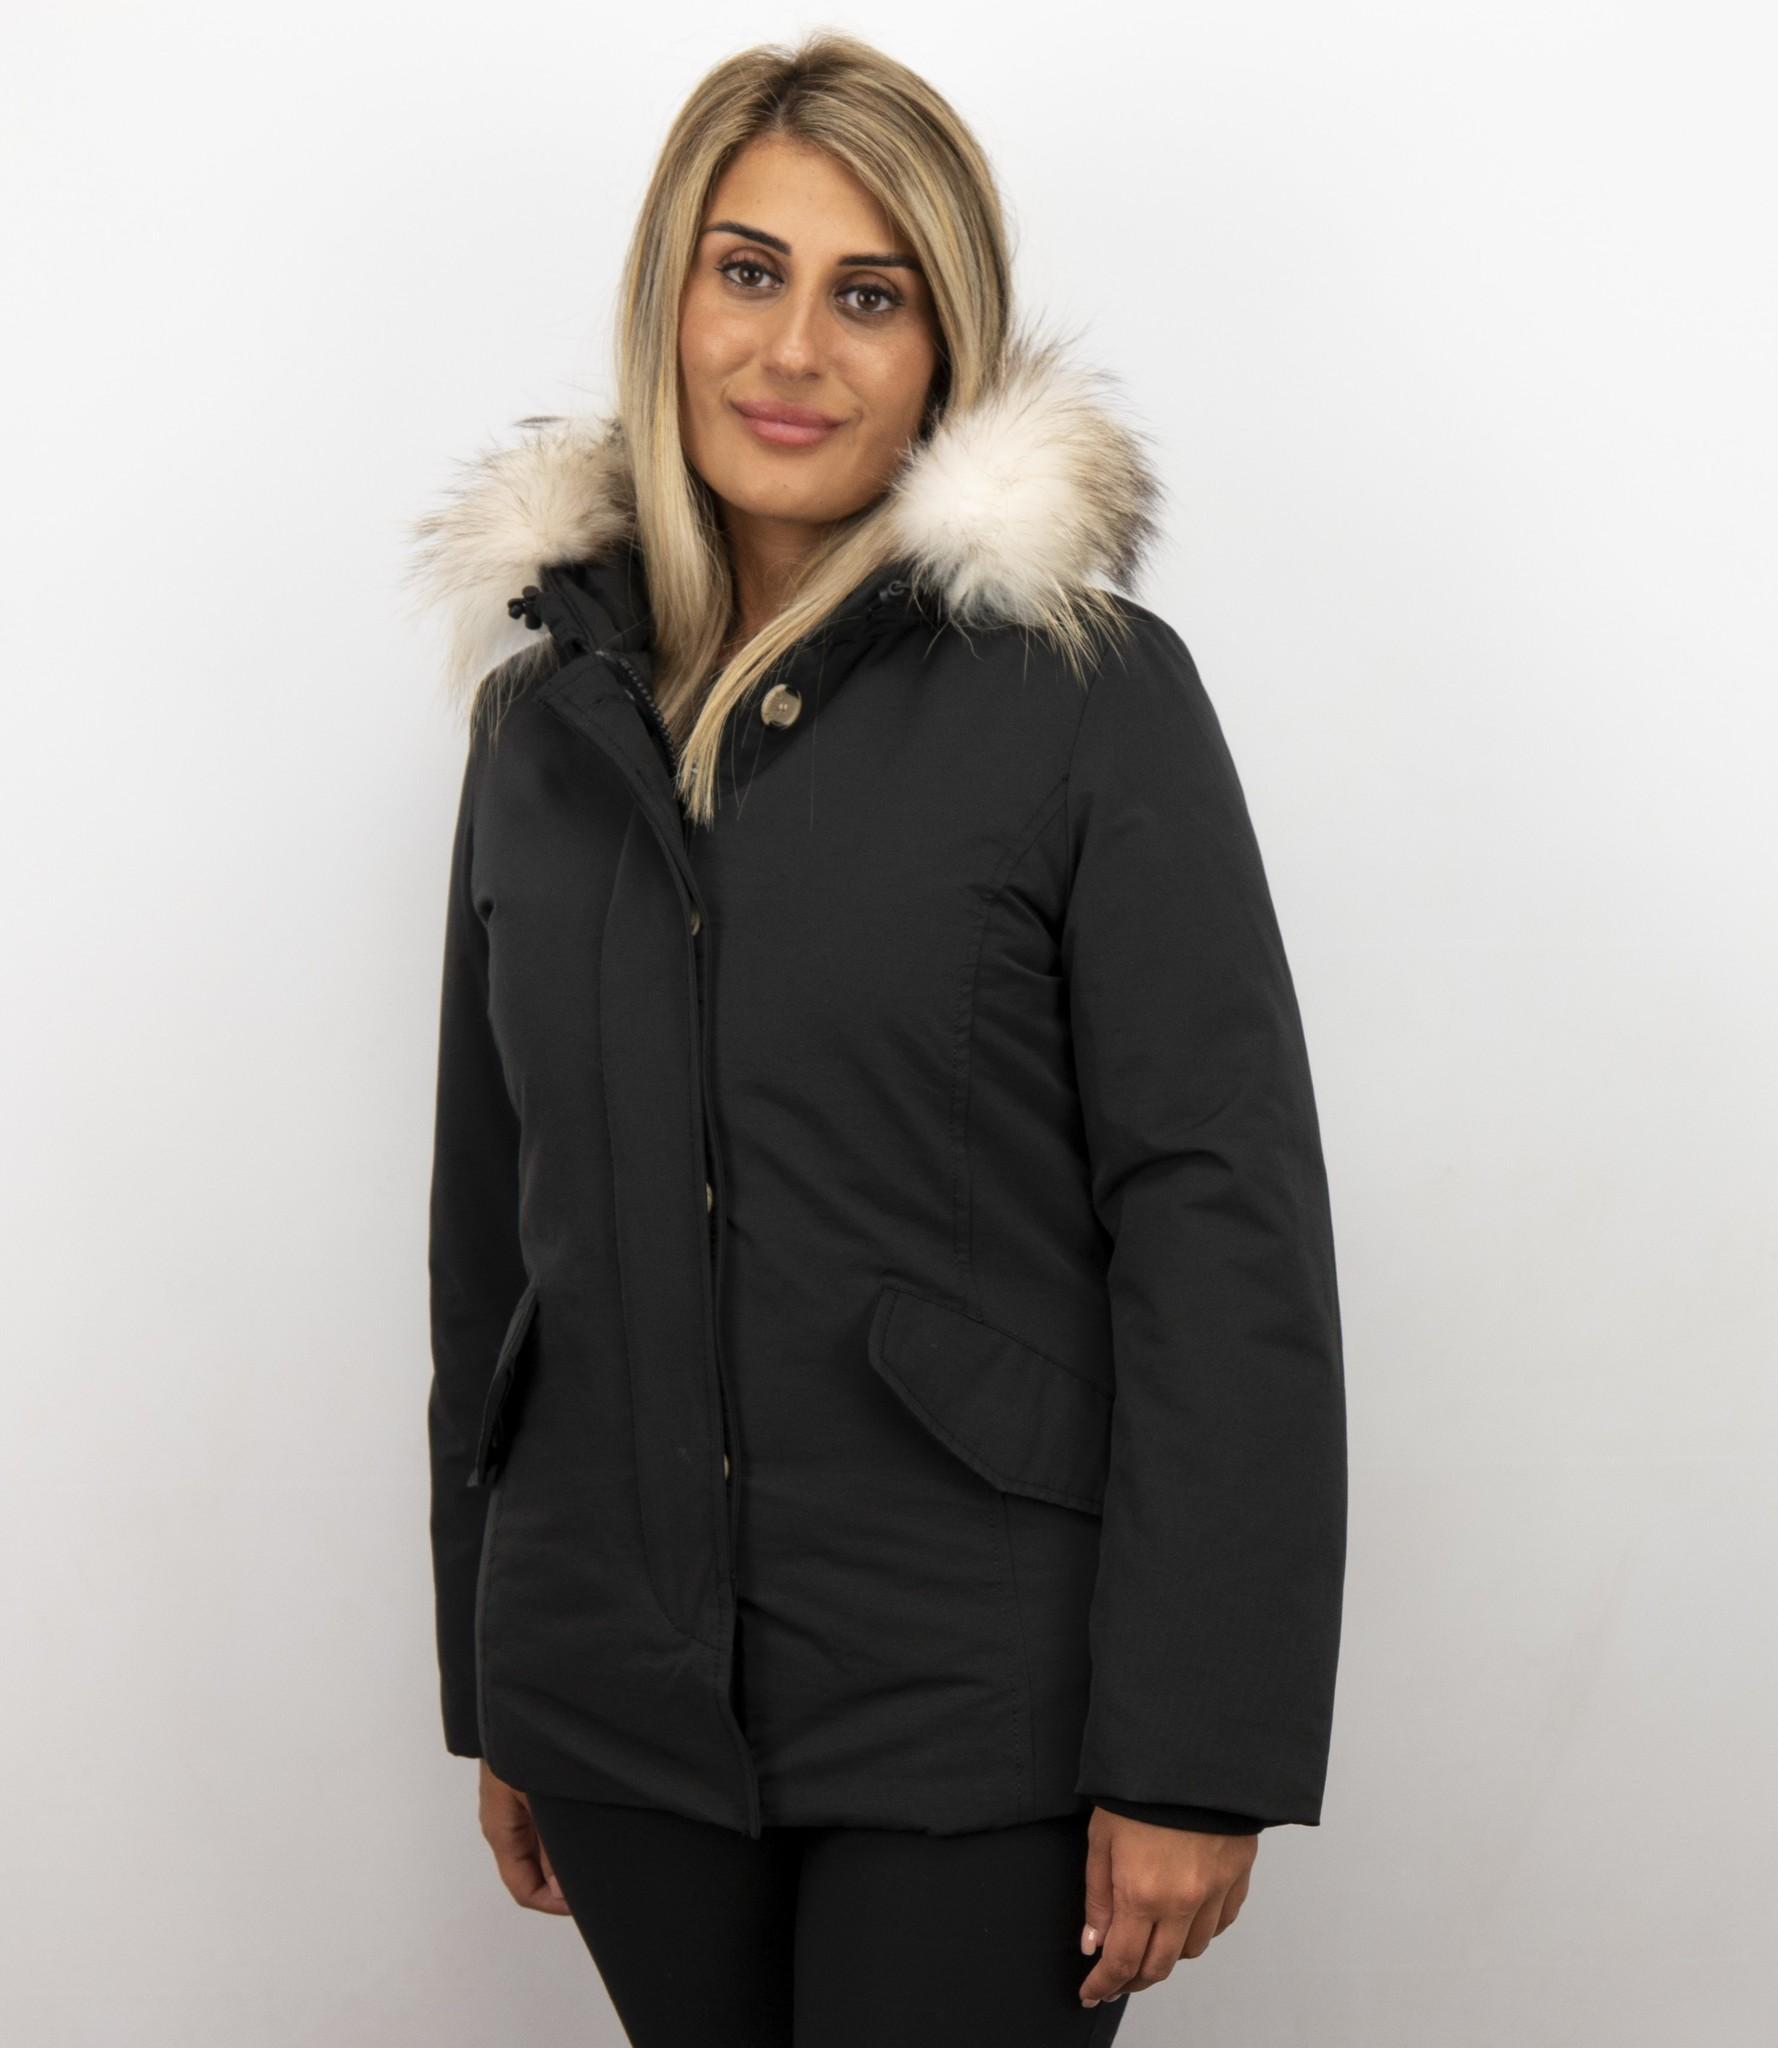 Winterjas zwart | Winterjas | Parka winterjas dames |